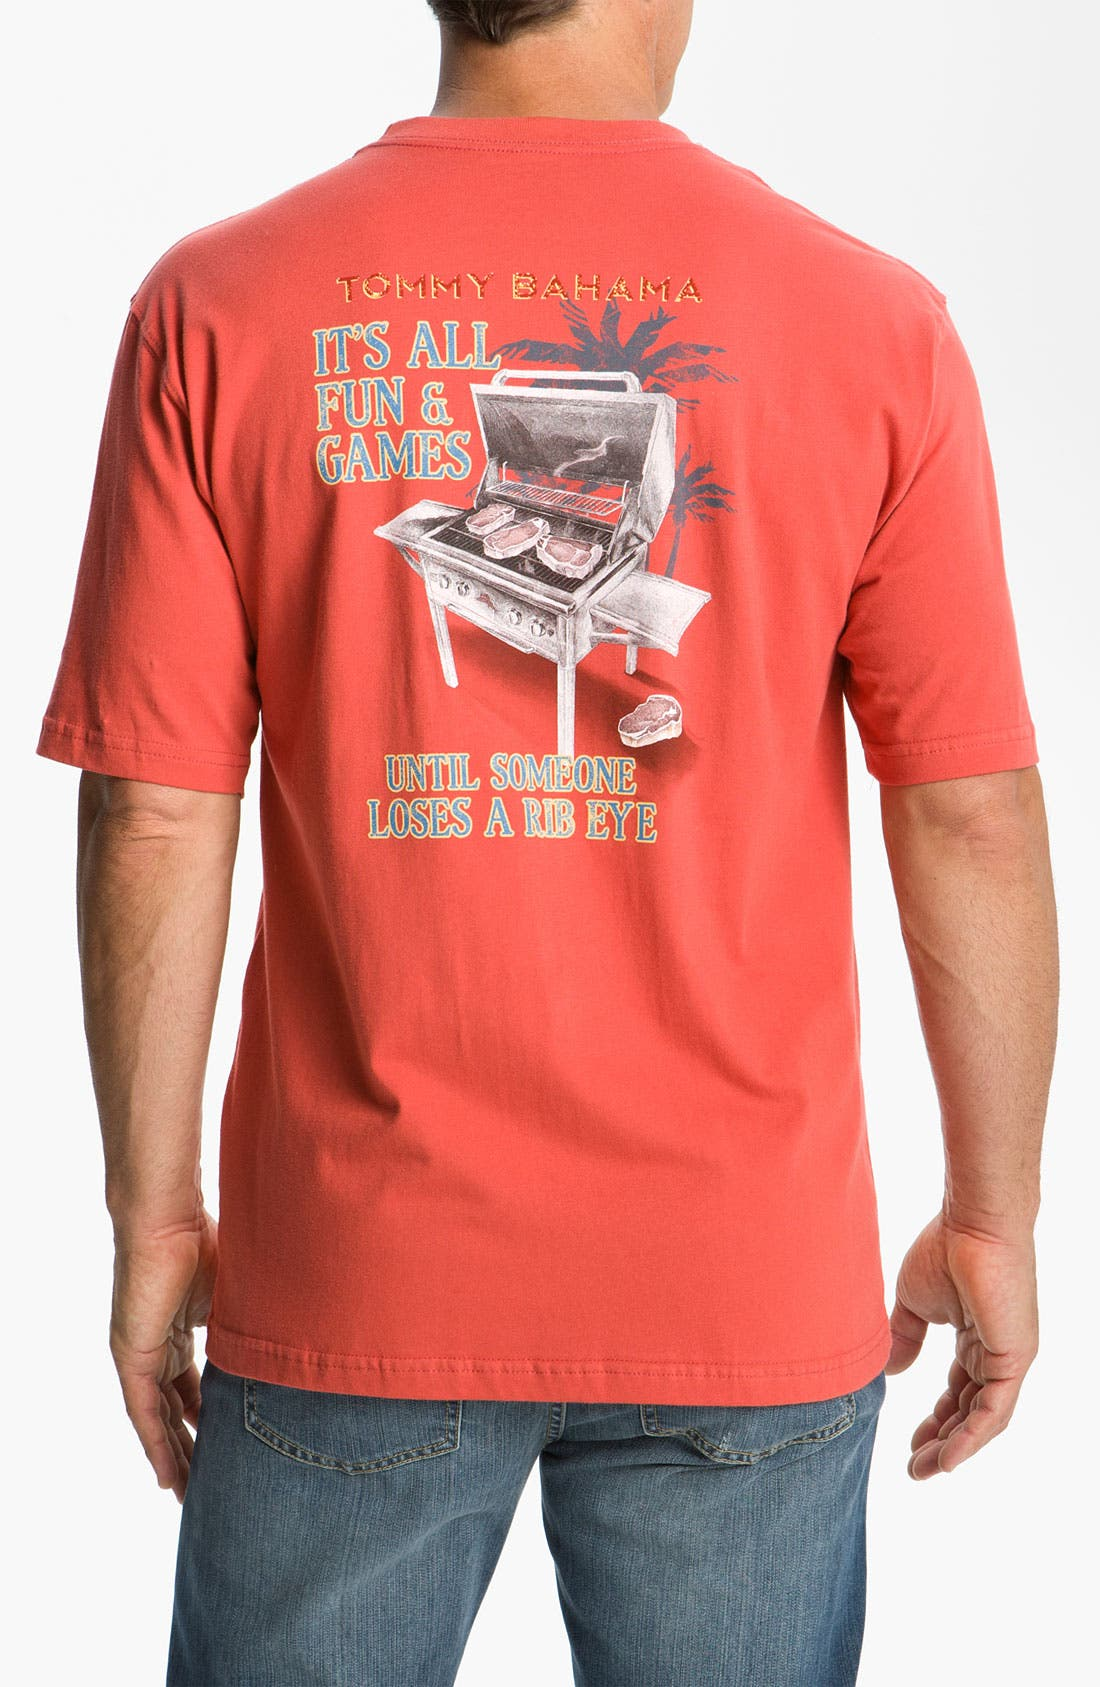 Main Image - Tommy Bahama 'It's All Fun & Games' Crewneck T-Shirt